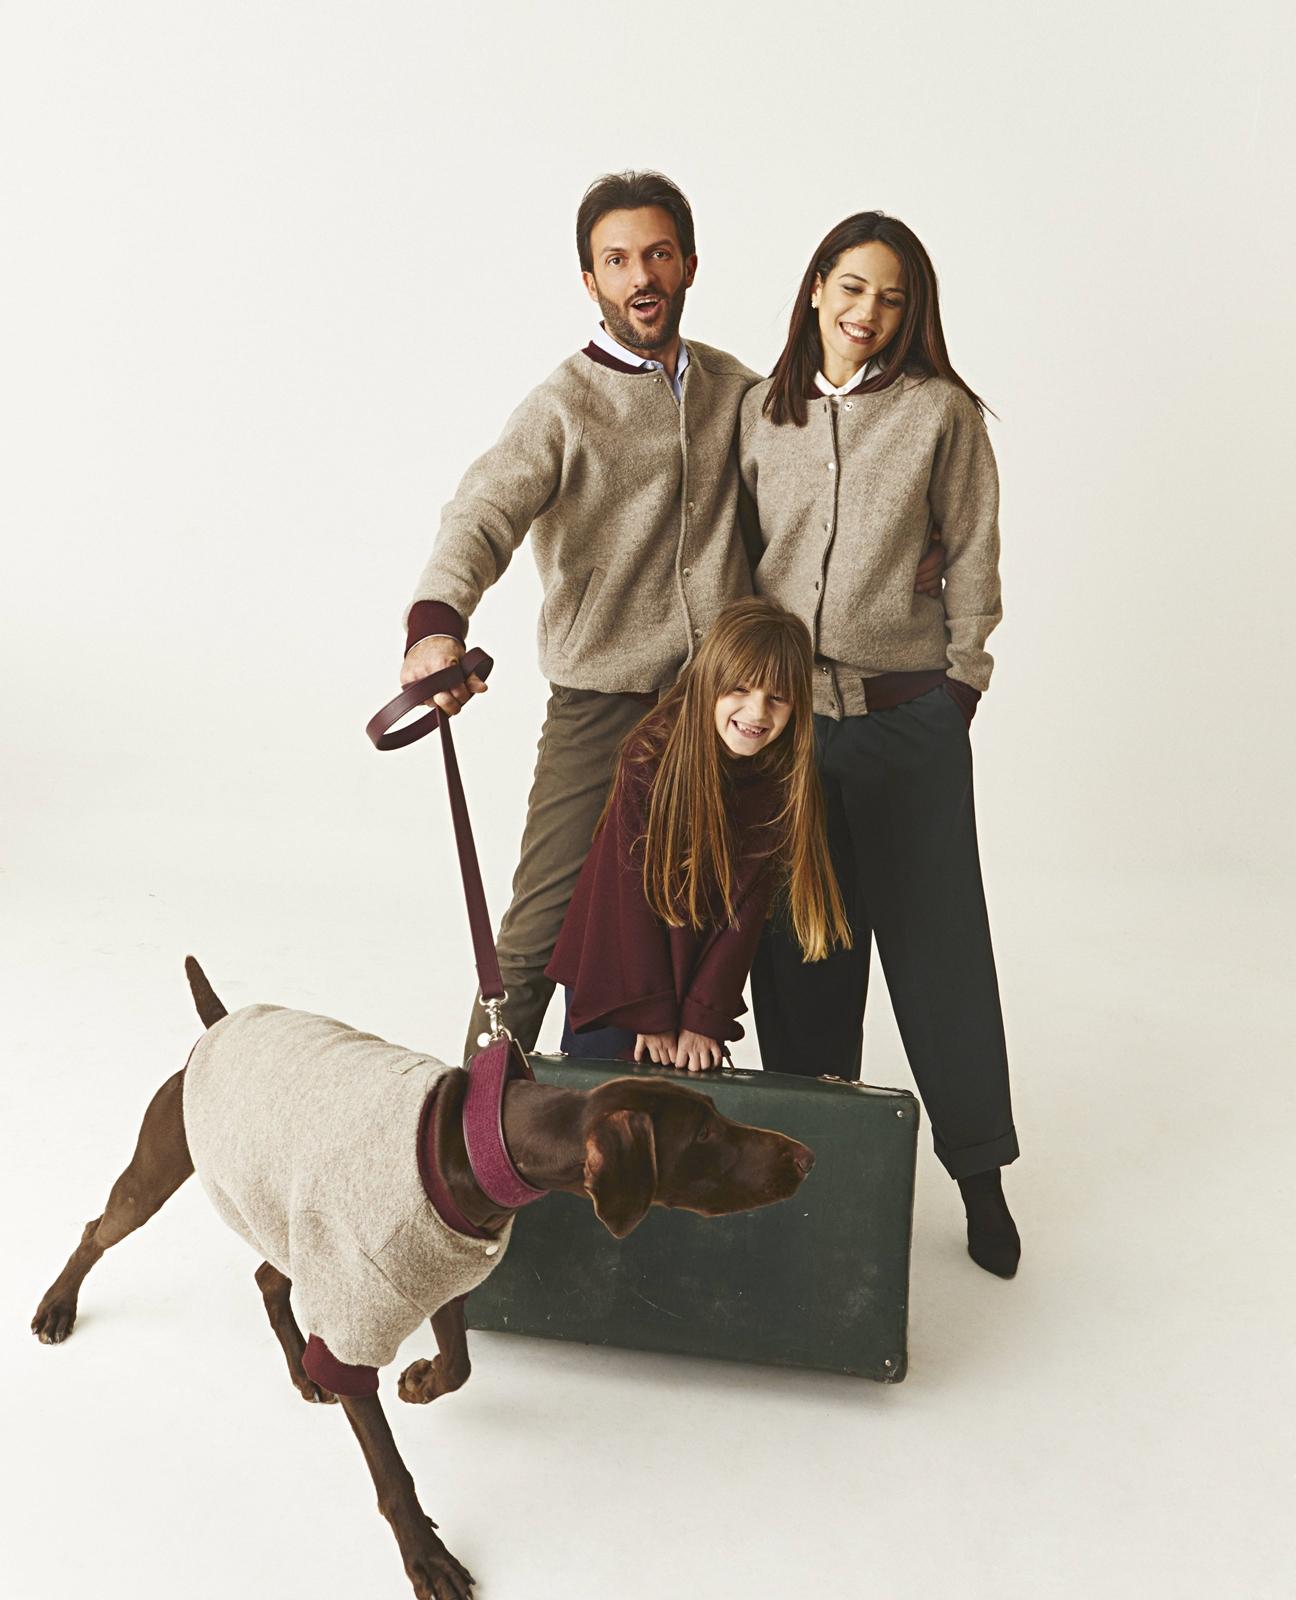 Chiara Mauro e Sofia con Jackie Dog à porter